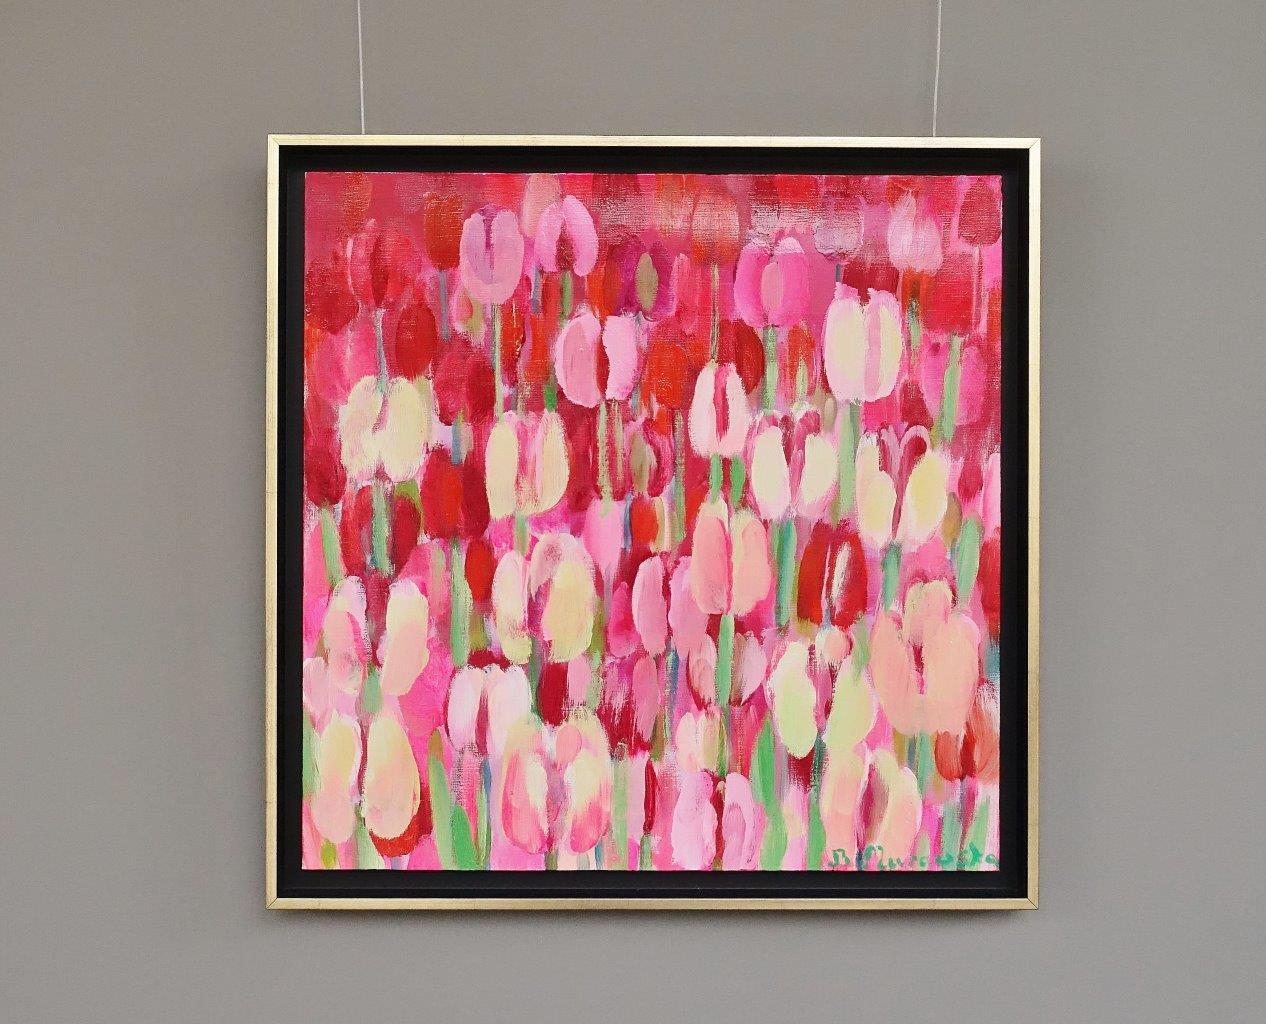 Beata Murawska : Pink secret